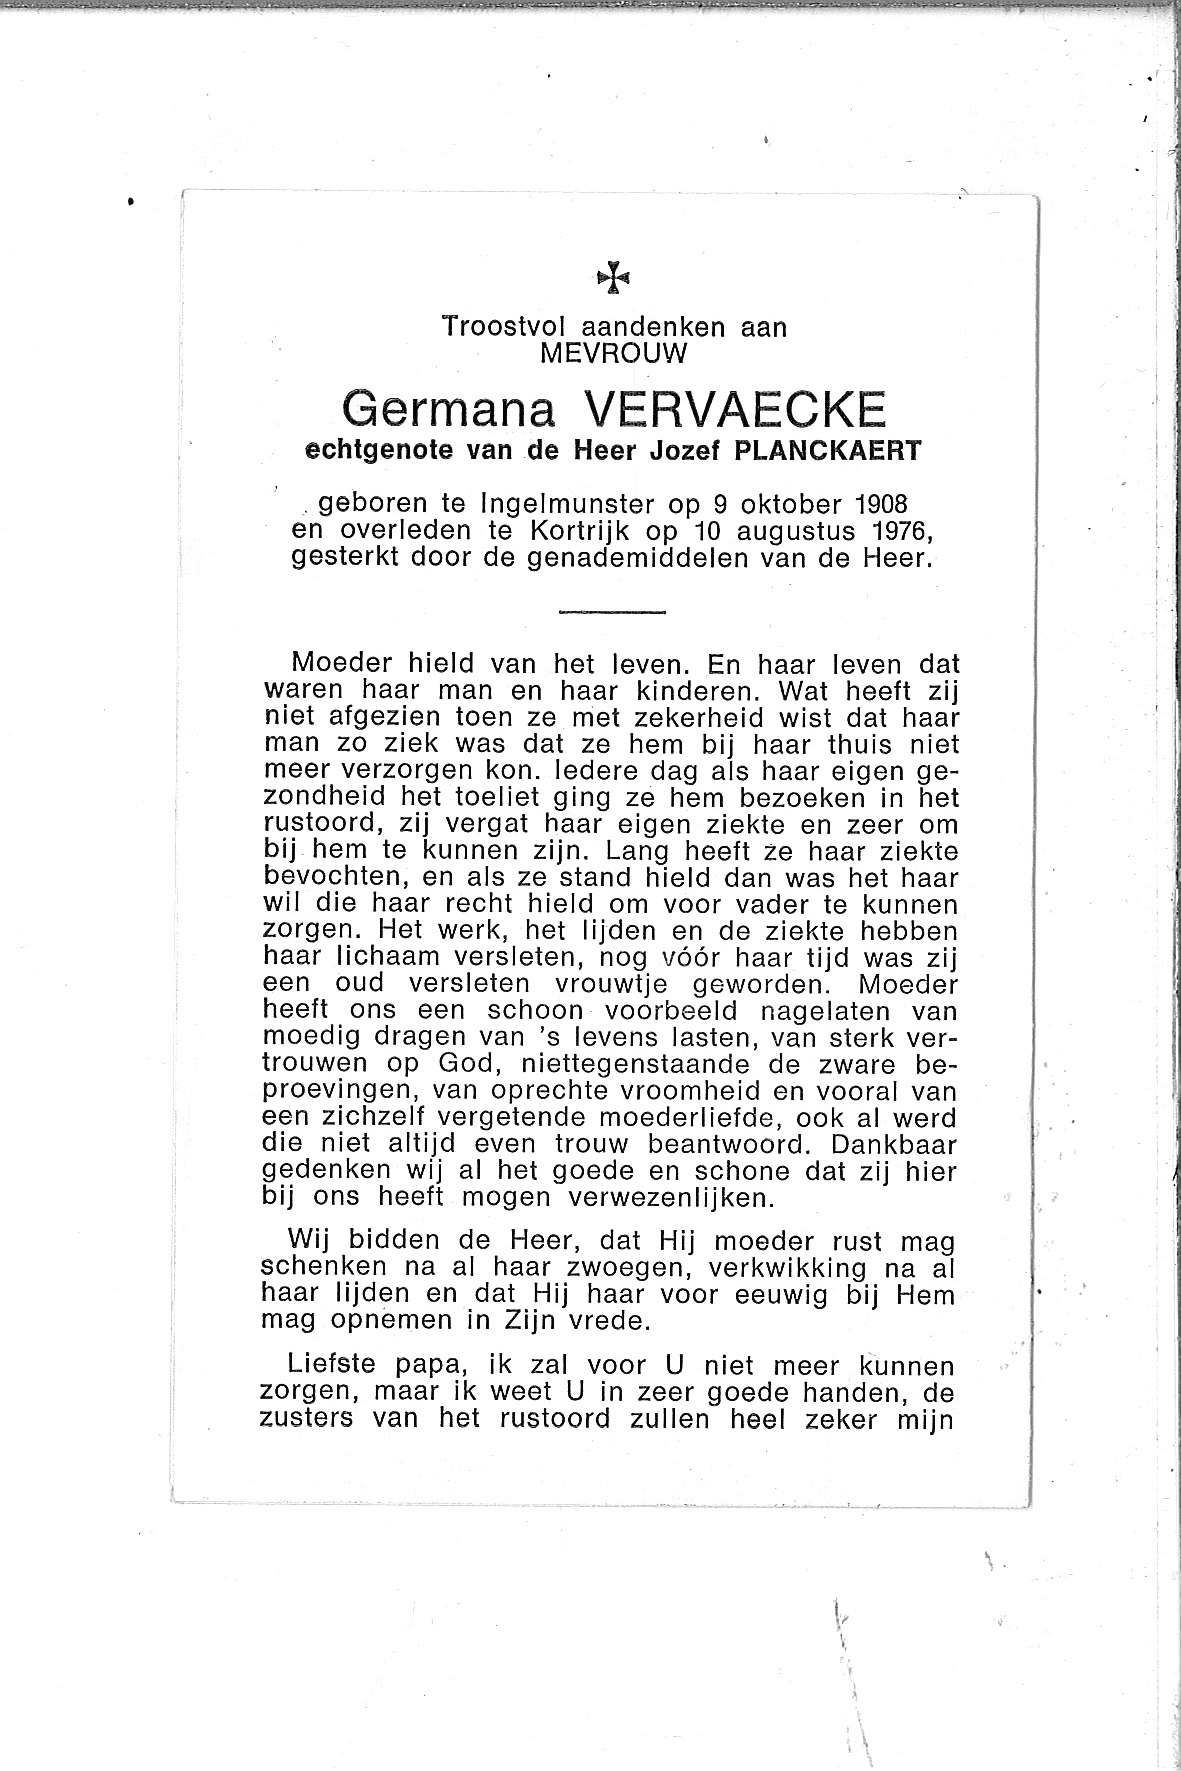 Germana(1976)20131211135643_00034.jpg